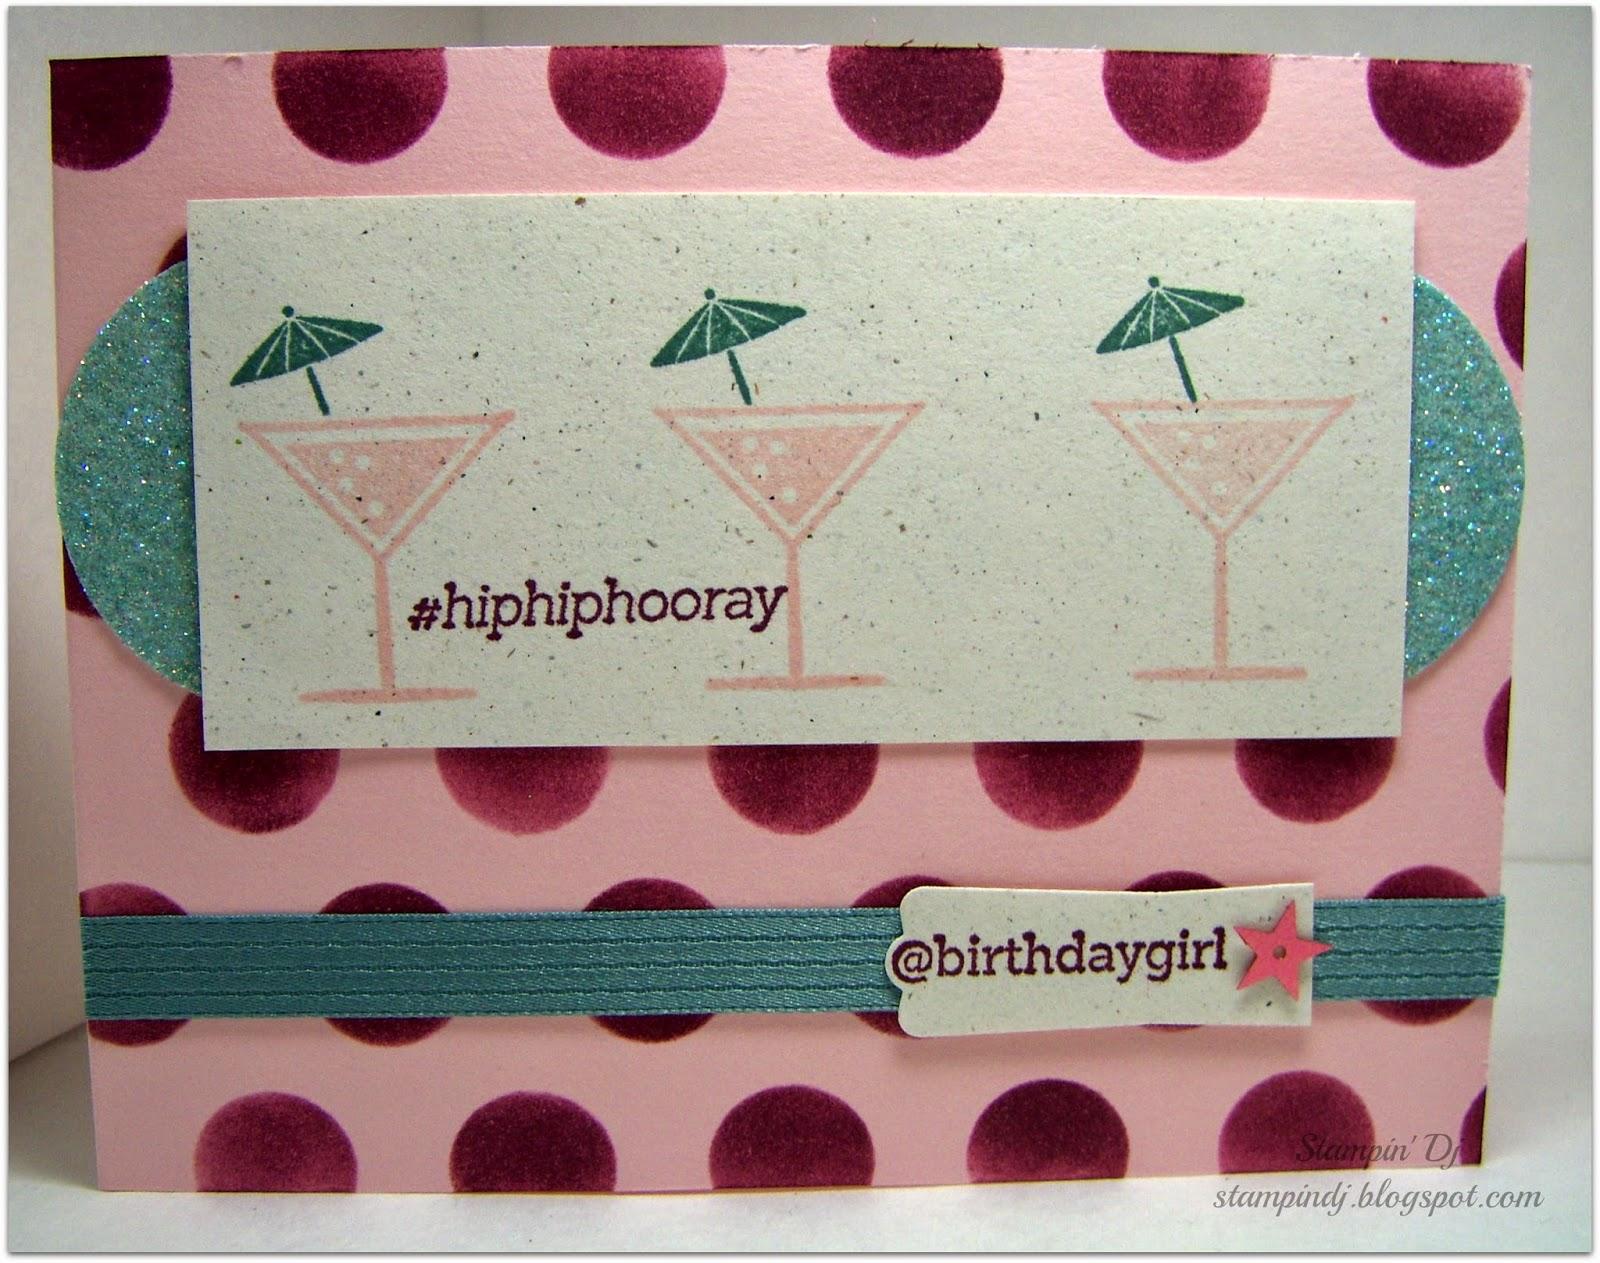 http://stampindj.blogspot.com/2014/07/birthday-hour.html